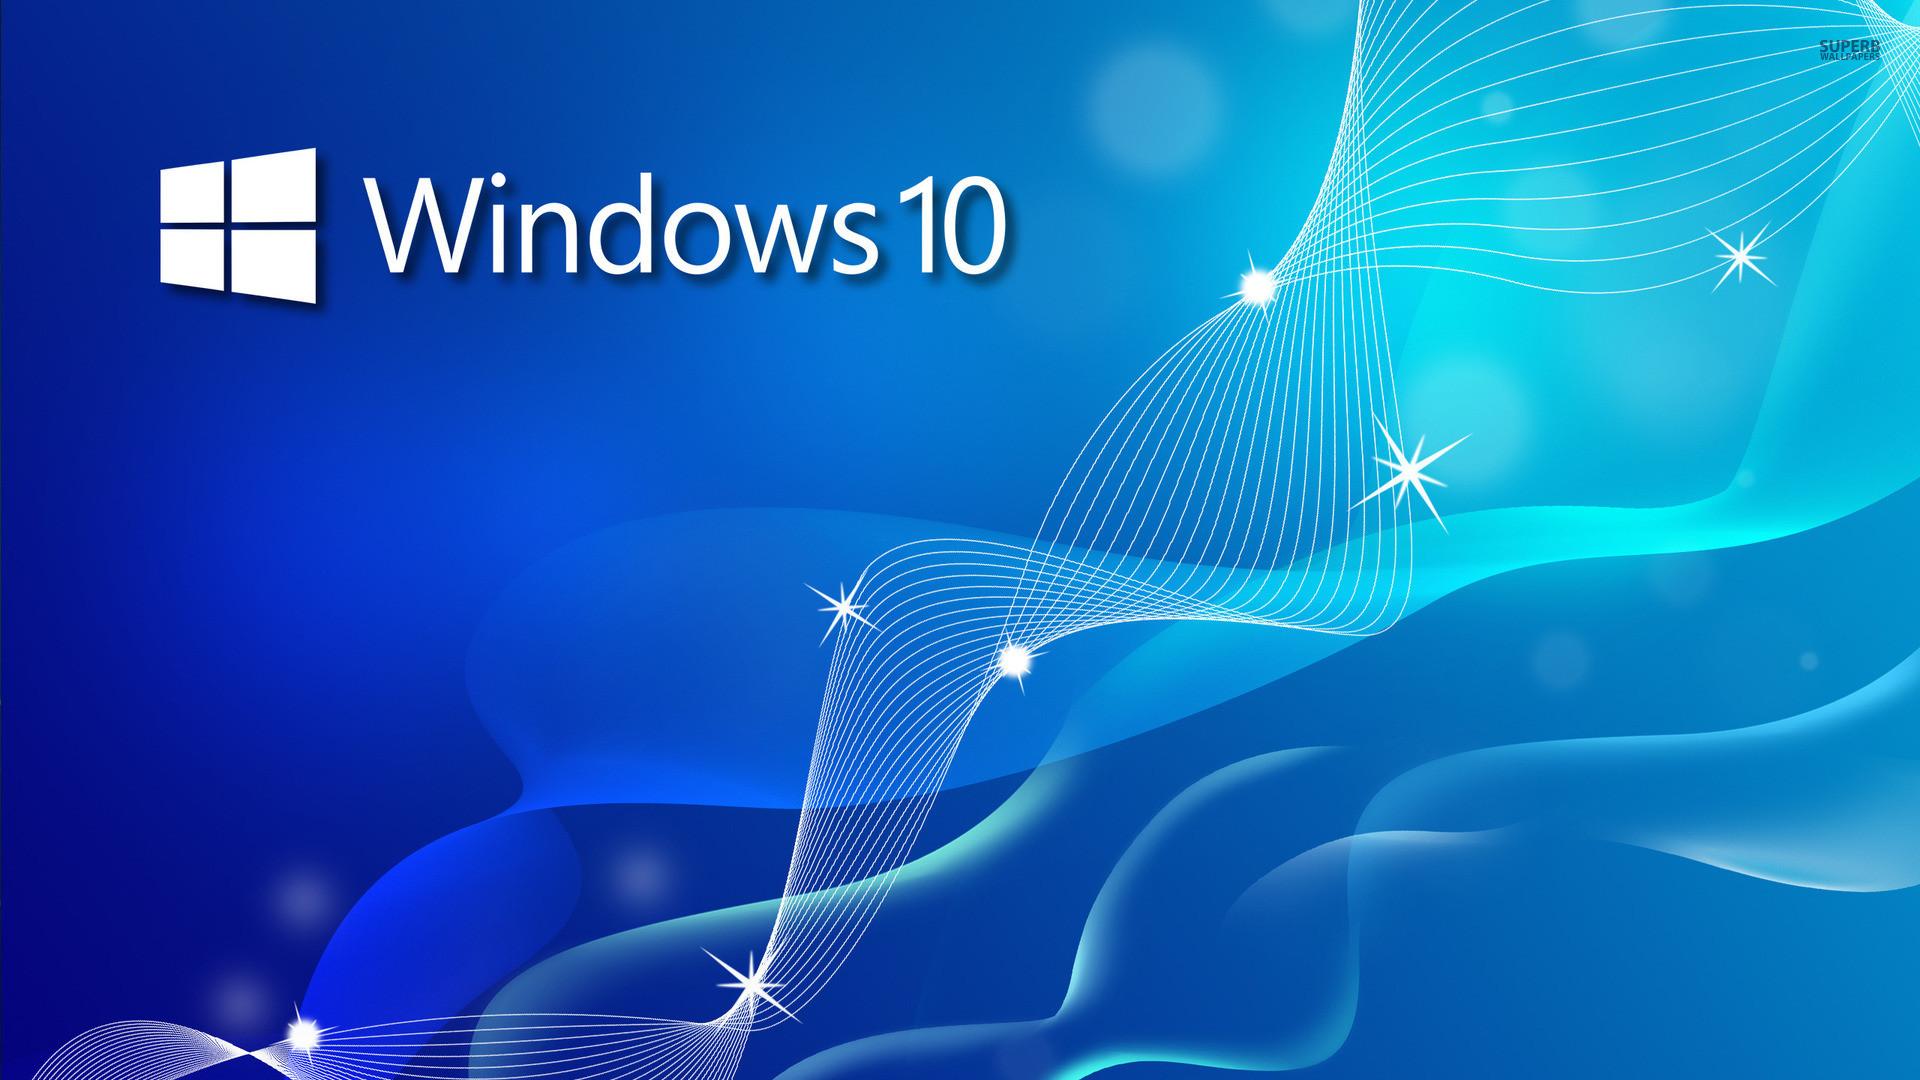 Windows 10 Logo HD Wallpaper (74+ Images